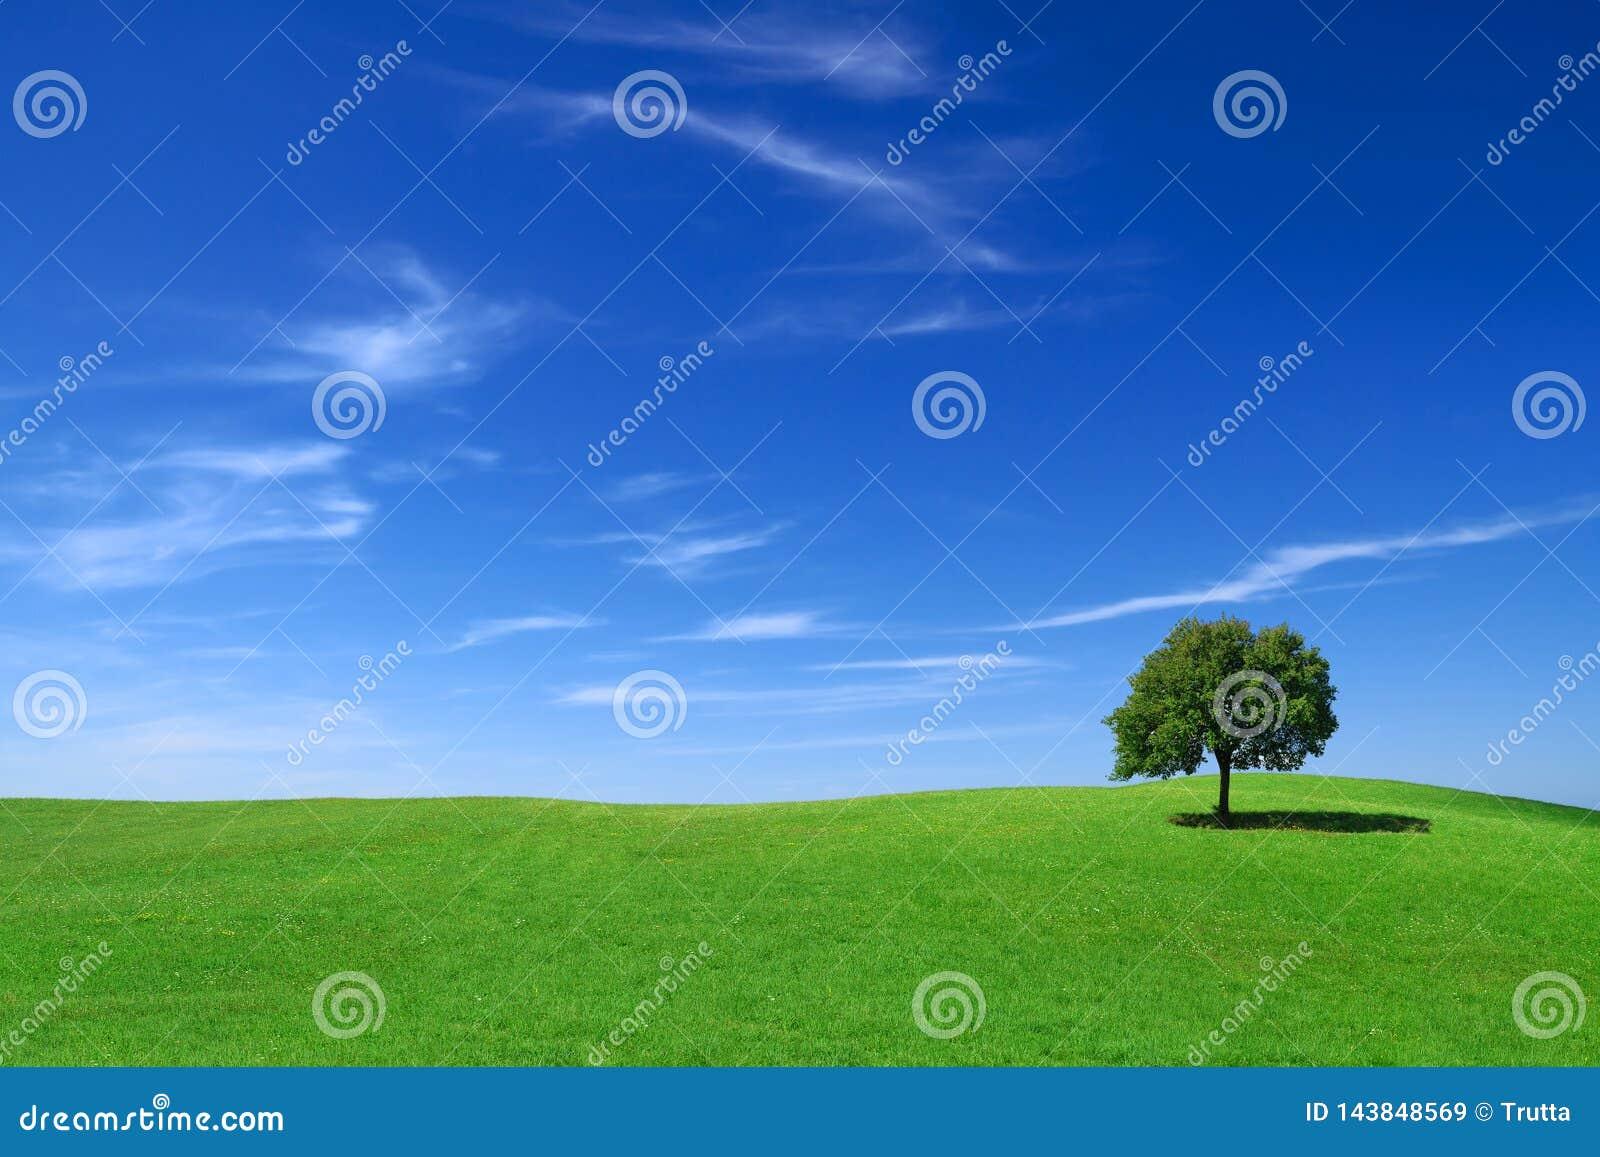 Idyllische Landschaft, einsamer Baum unter grünen Feldern